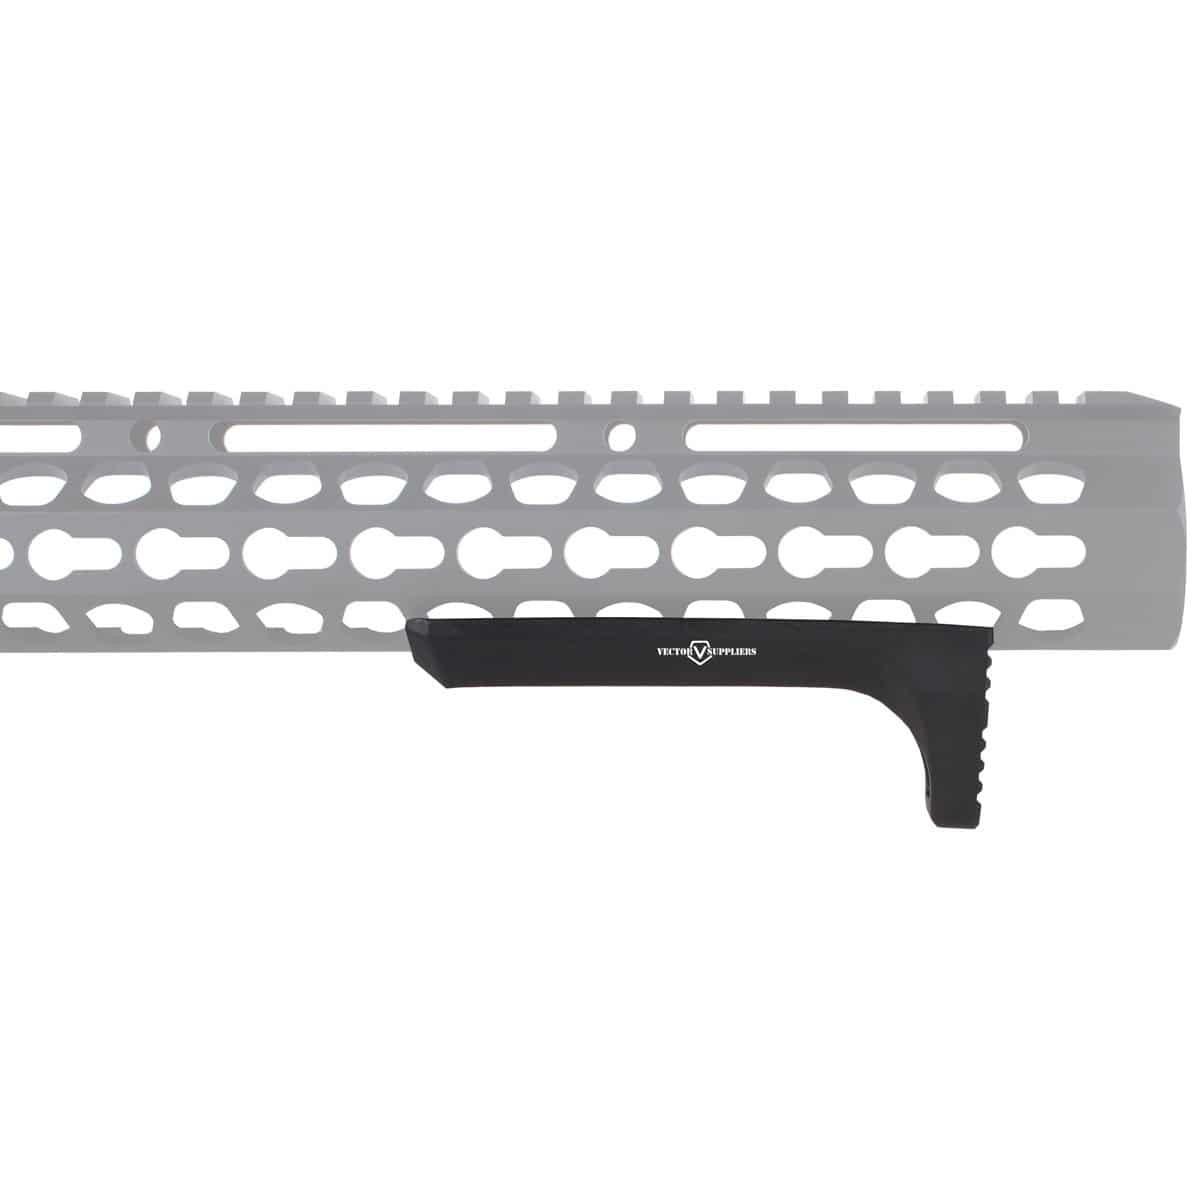 KeyMod Handguard Rail Hand Stop Grip